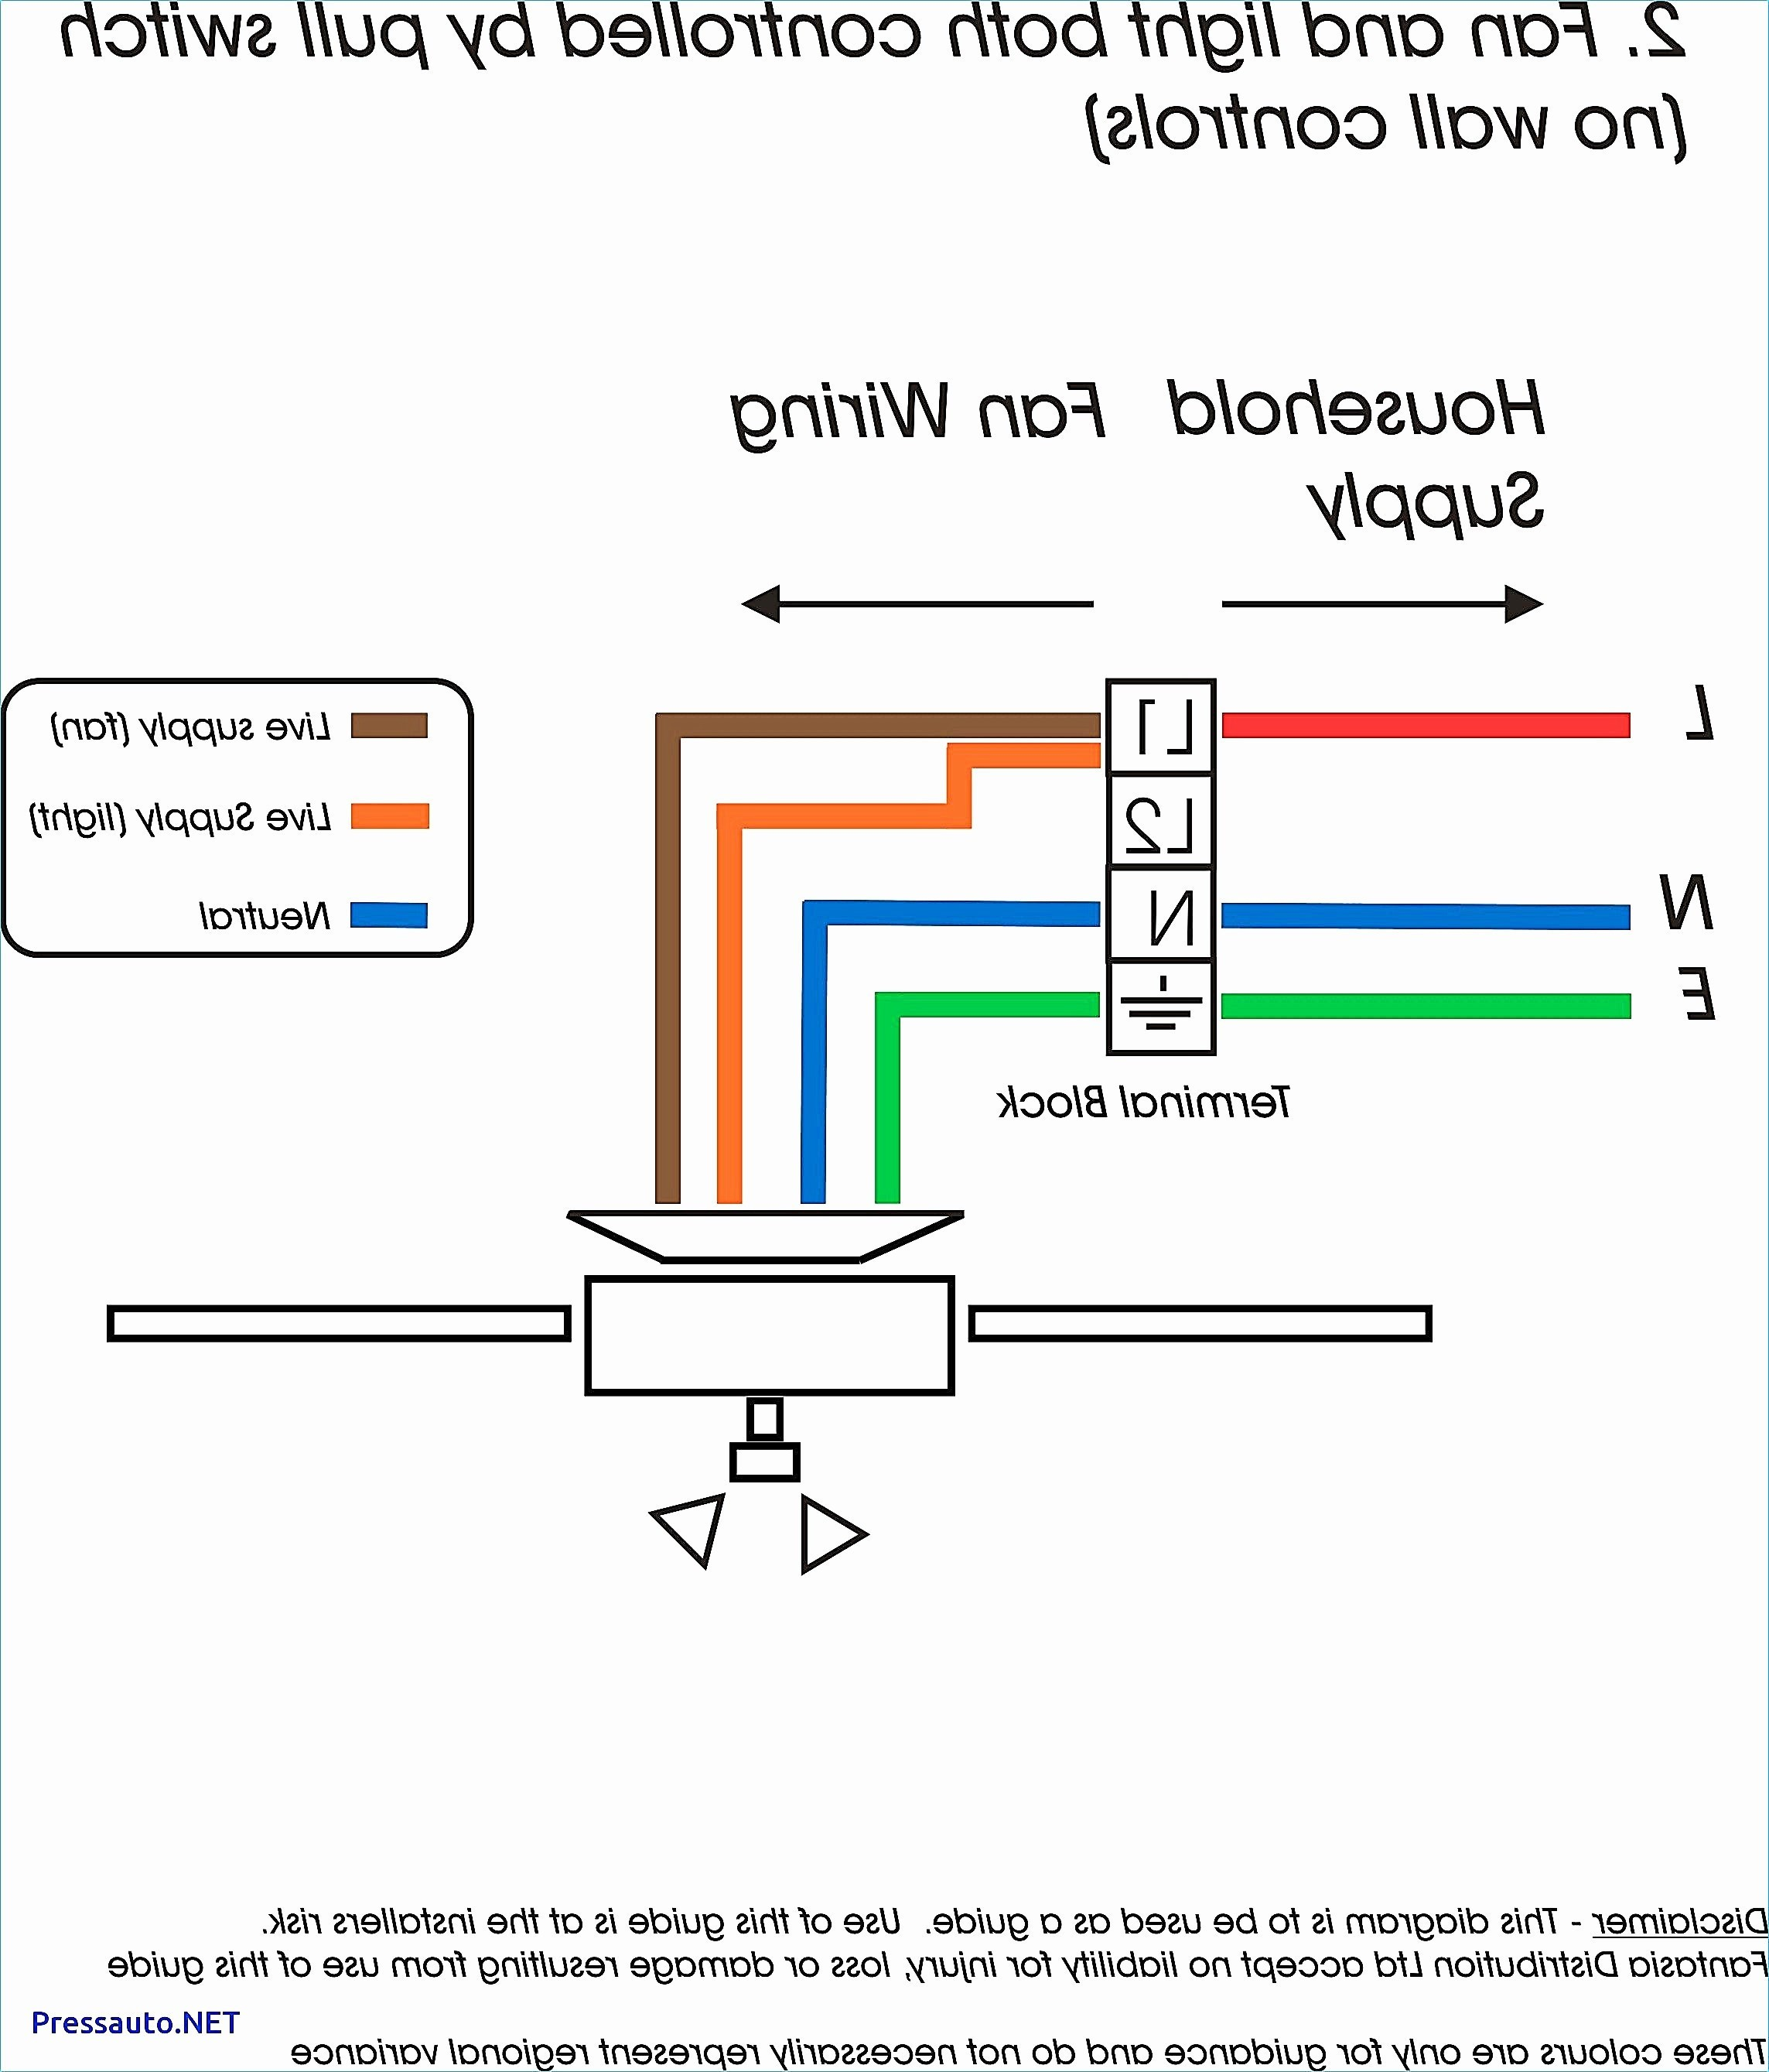 1969 Chevelle Wiring Diagram 67 Chevelle Gas Gauge Wiring Diagram Detailed Schematic Diagrams Of 1969 Chevelle Wiring Diagram